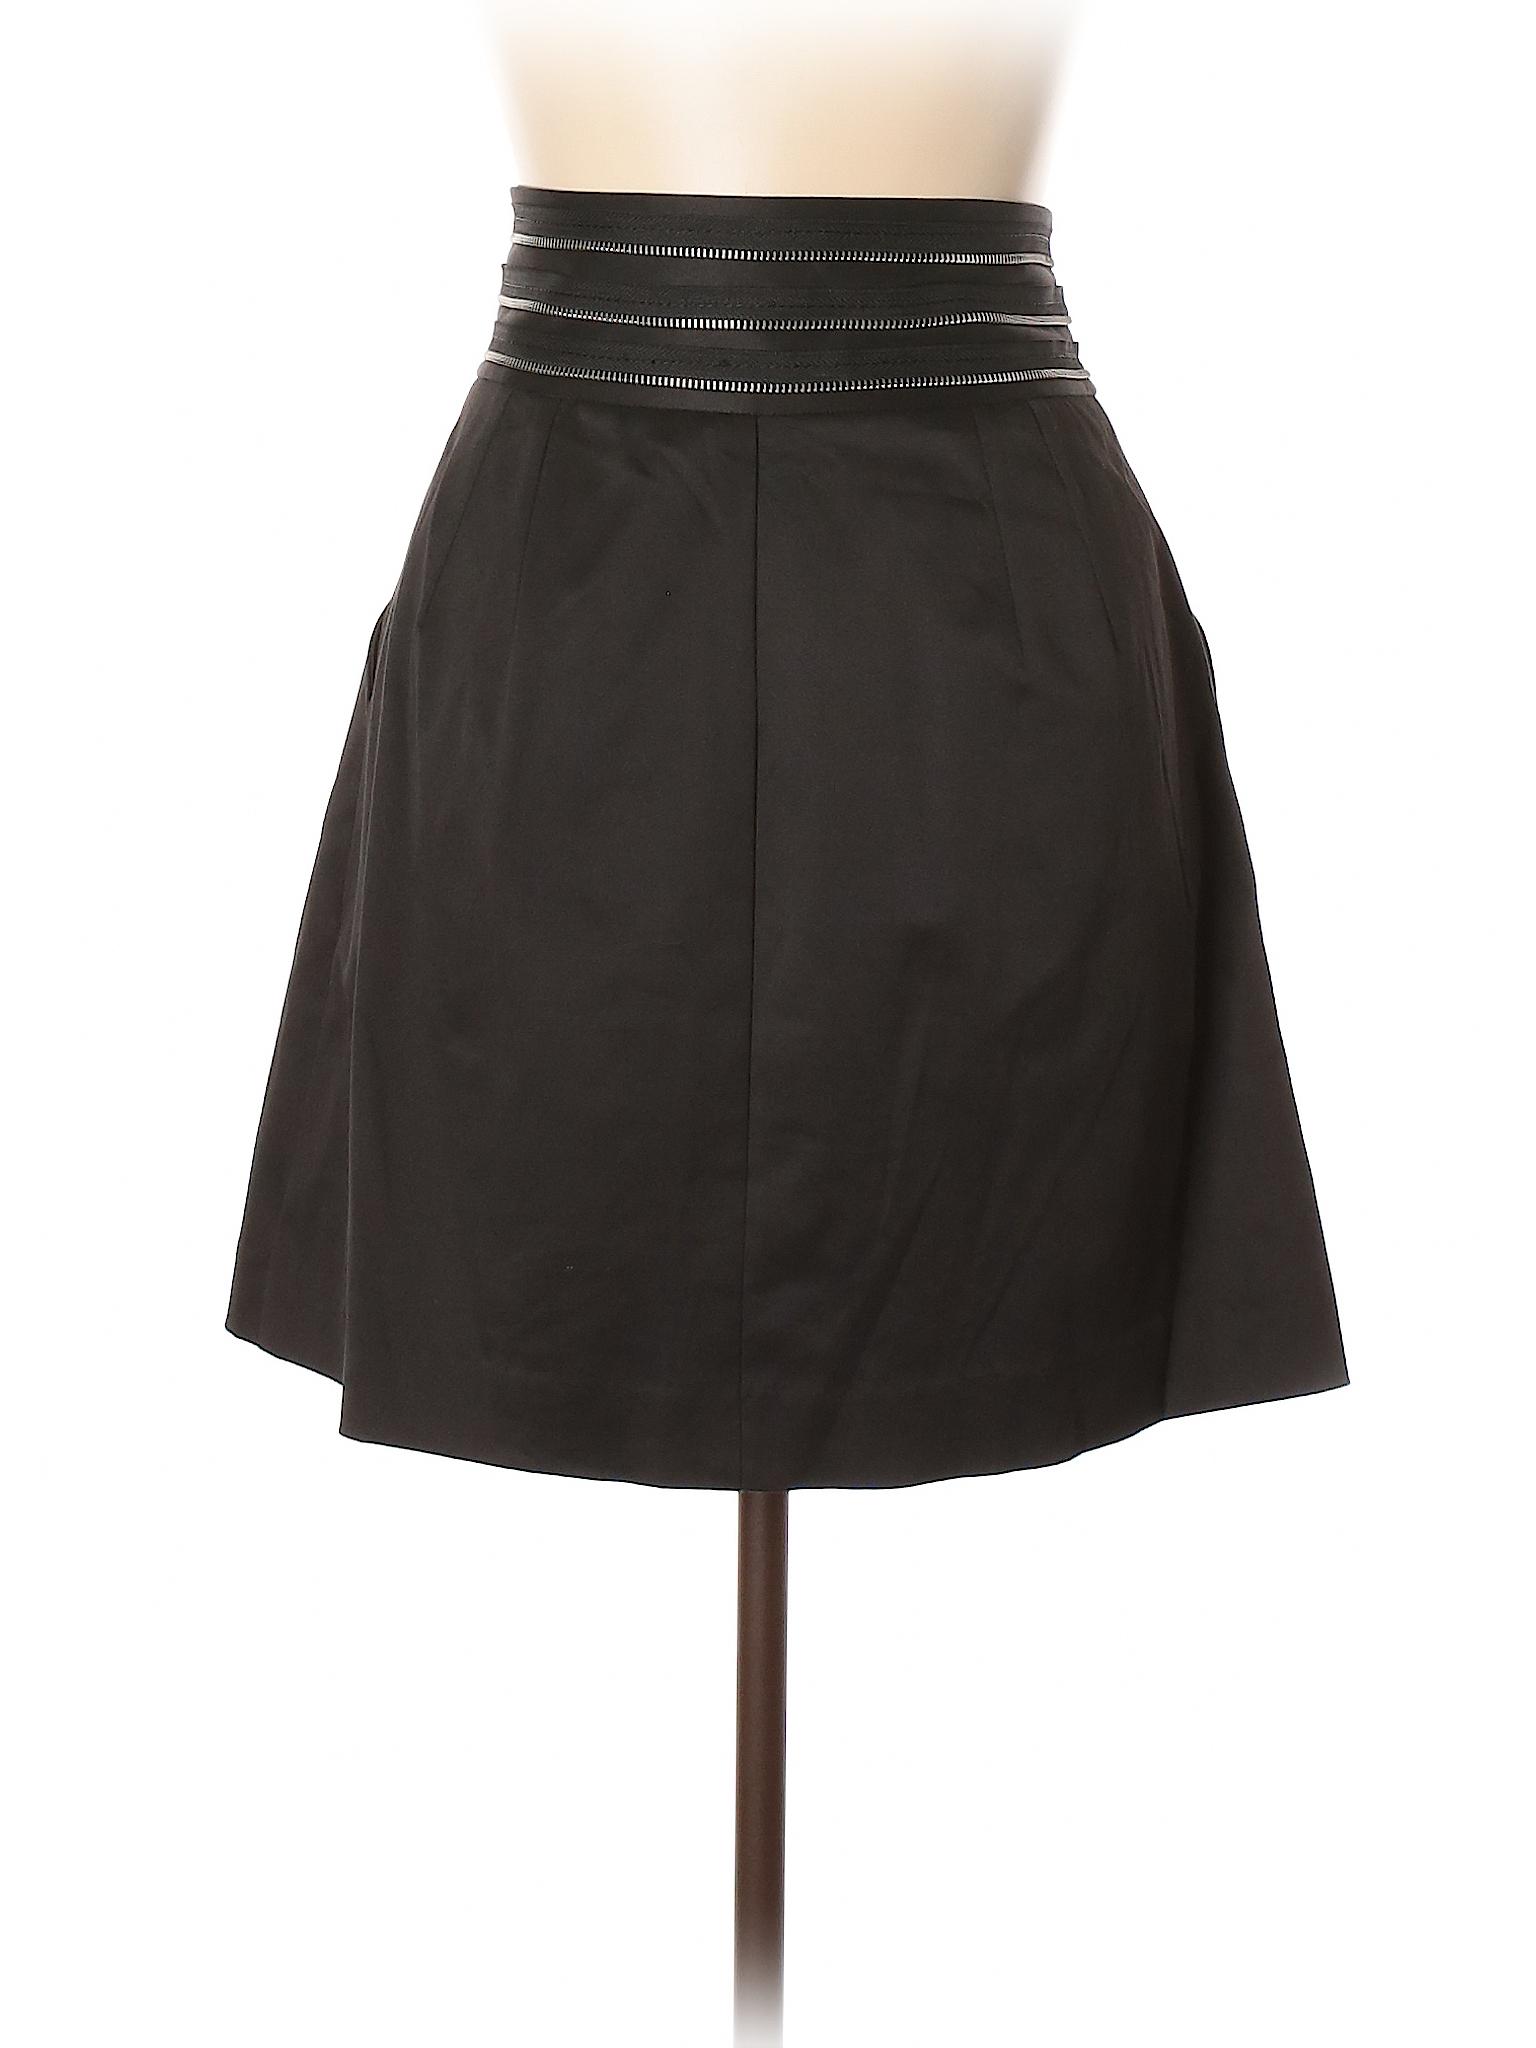 Leisure winter Leisure winter Casual Aqua winter Casual Skirt Skirt Leisure Aqua r5TxrwaqUn